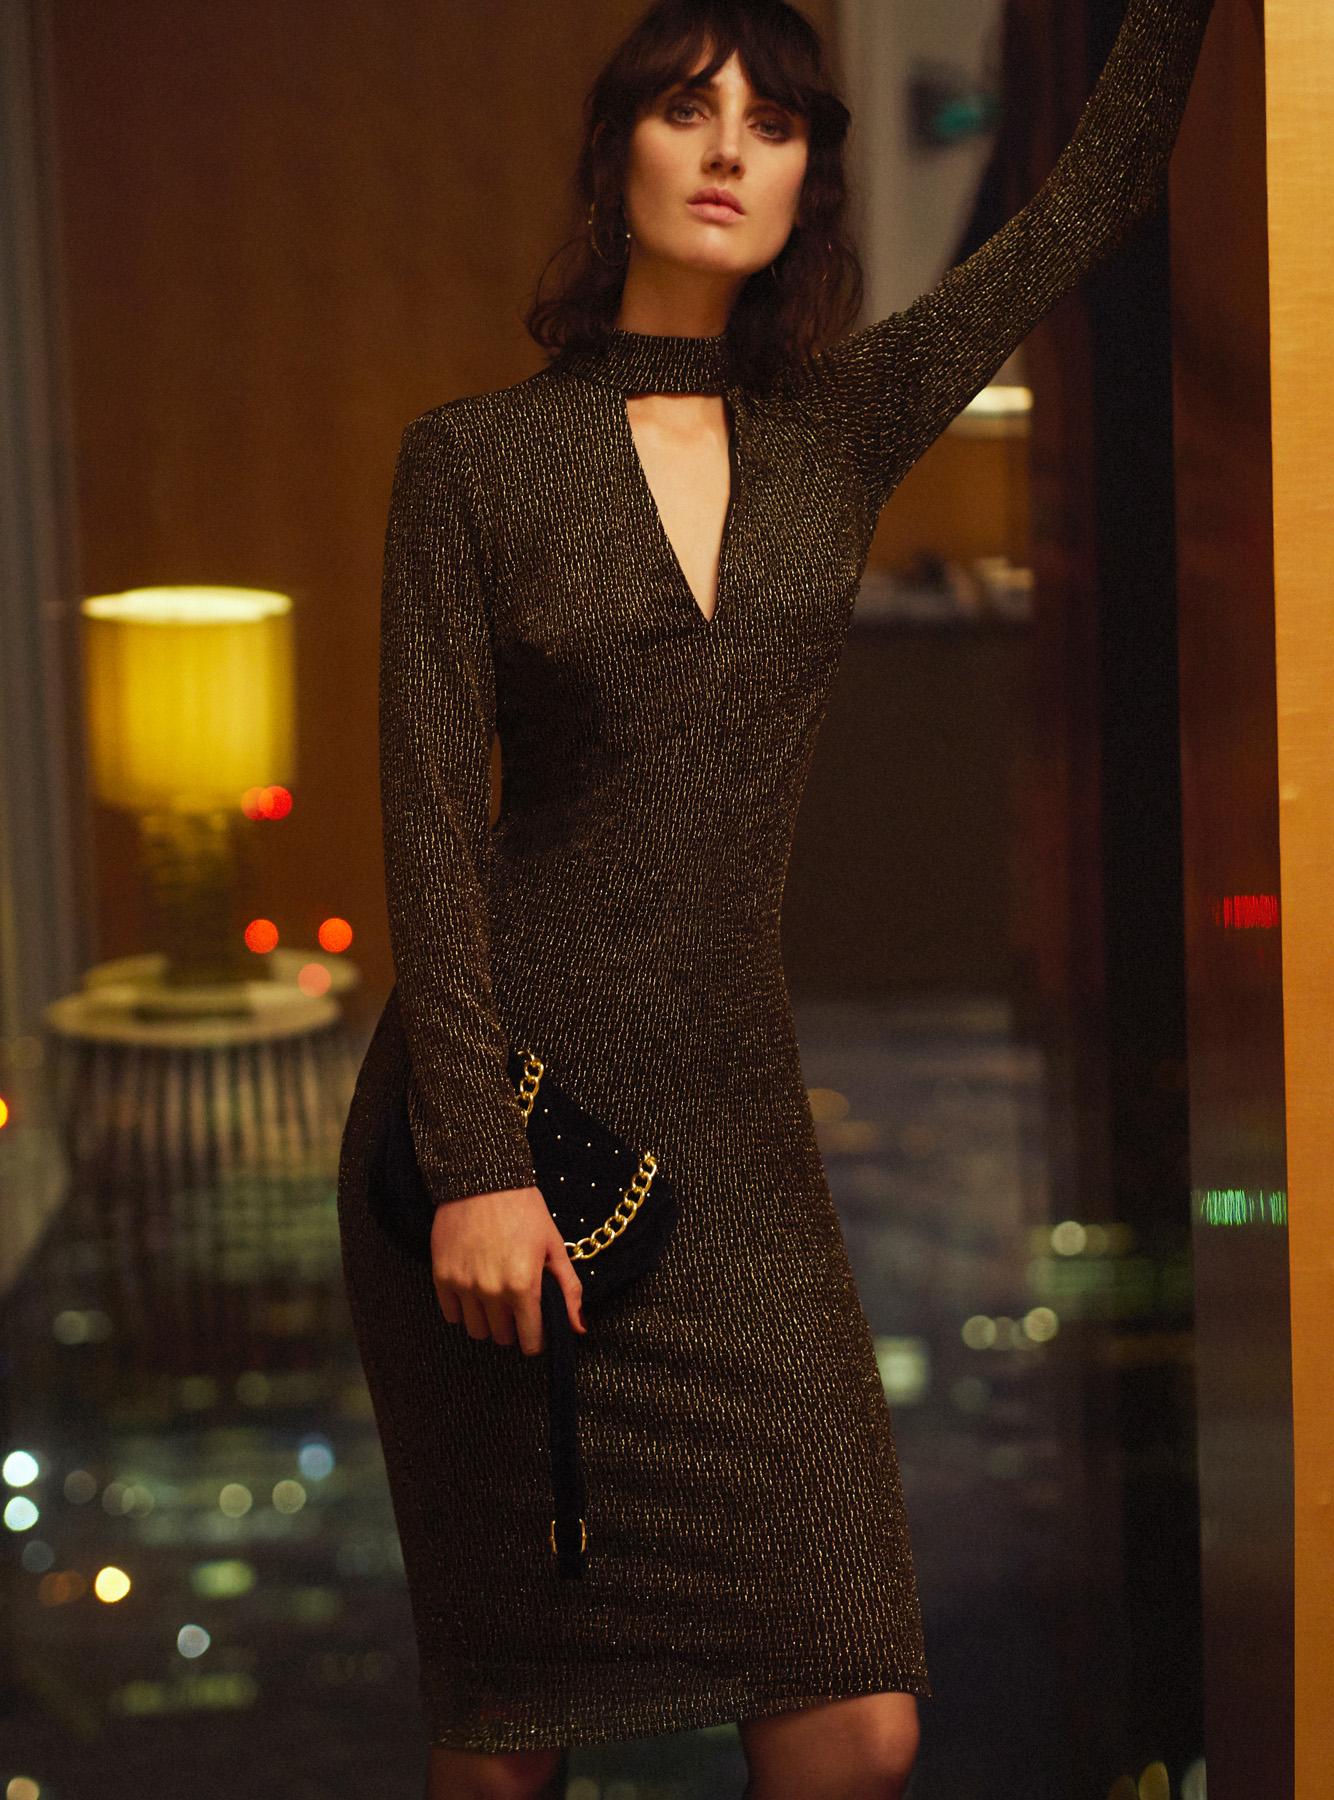 095-icon-artist-management-Kristin-Vicari-Fashion-Glamour x Primark02.jpg